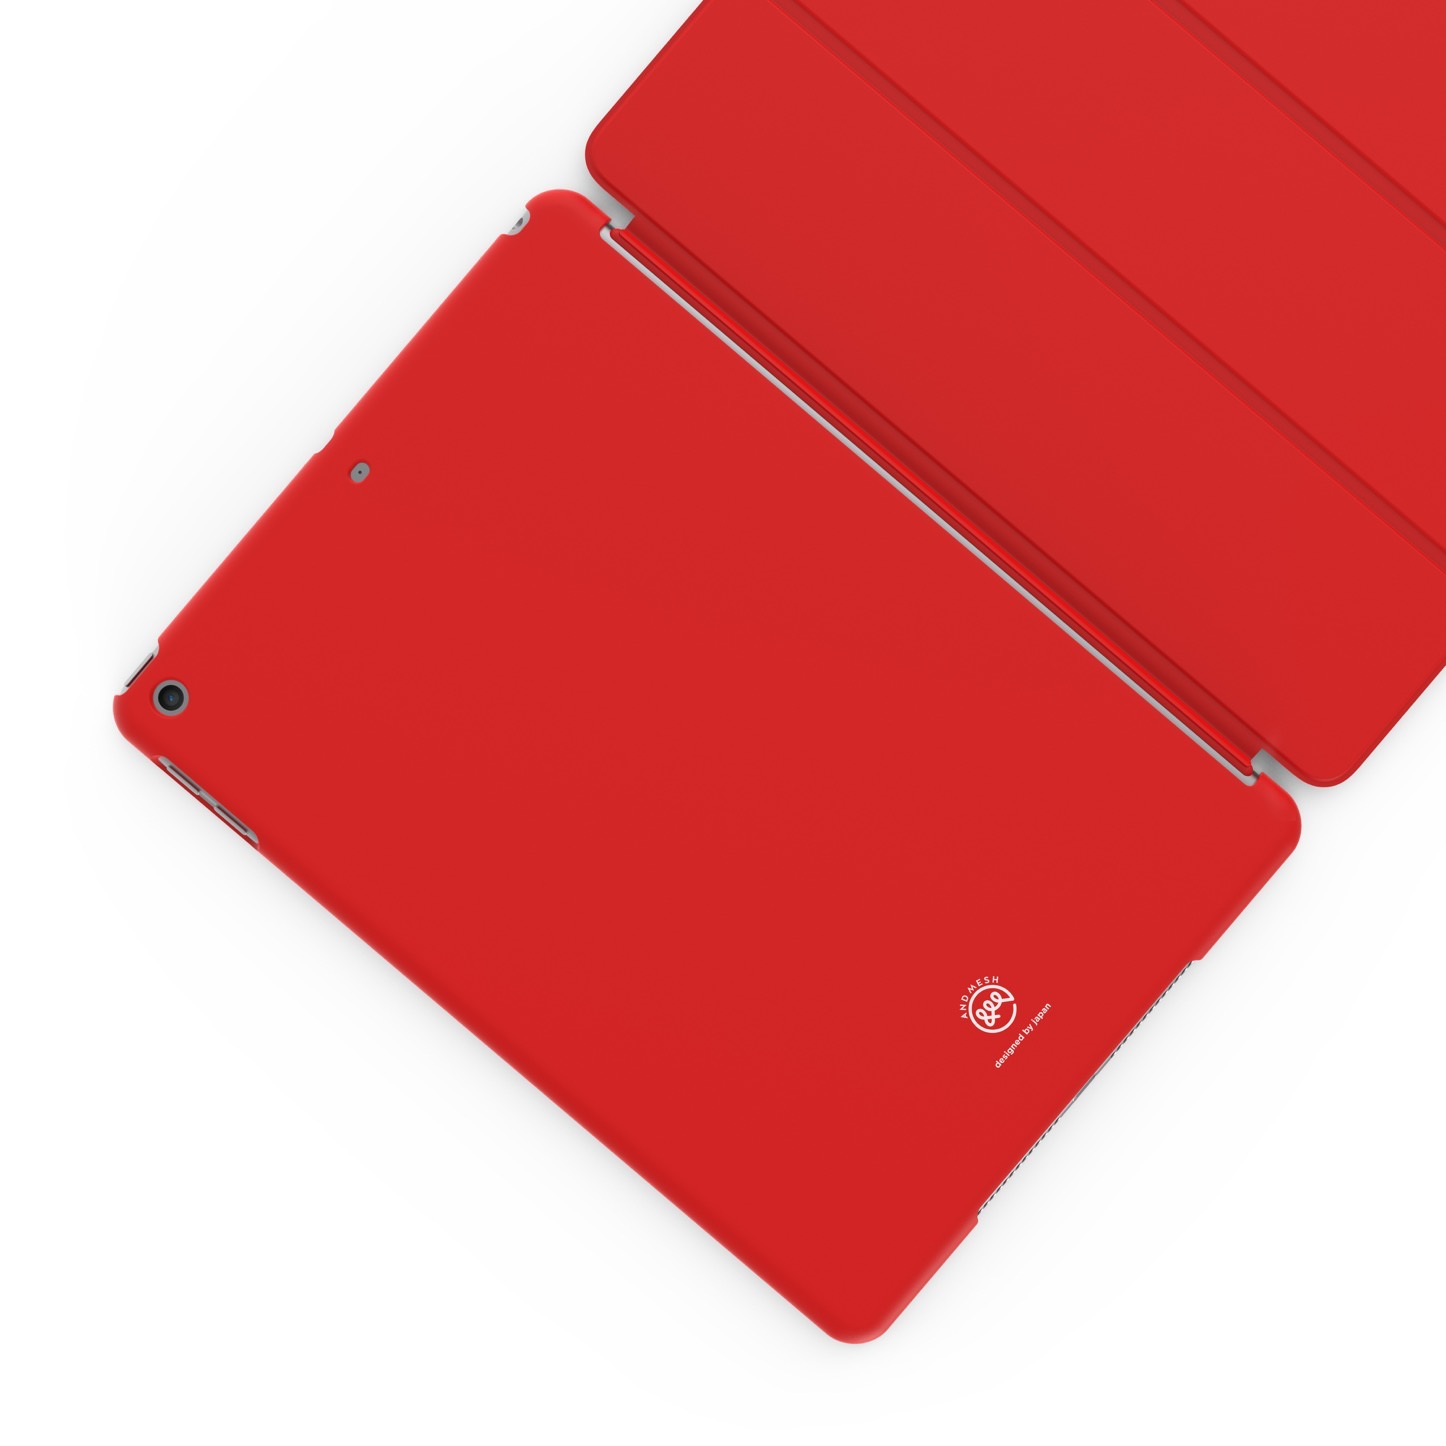 AndMesh-iPad-Pro-9_7-05.jpg